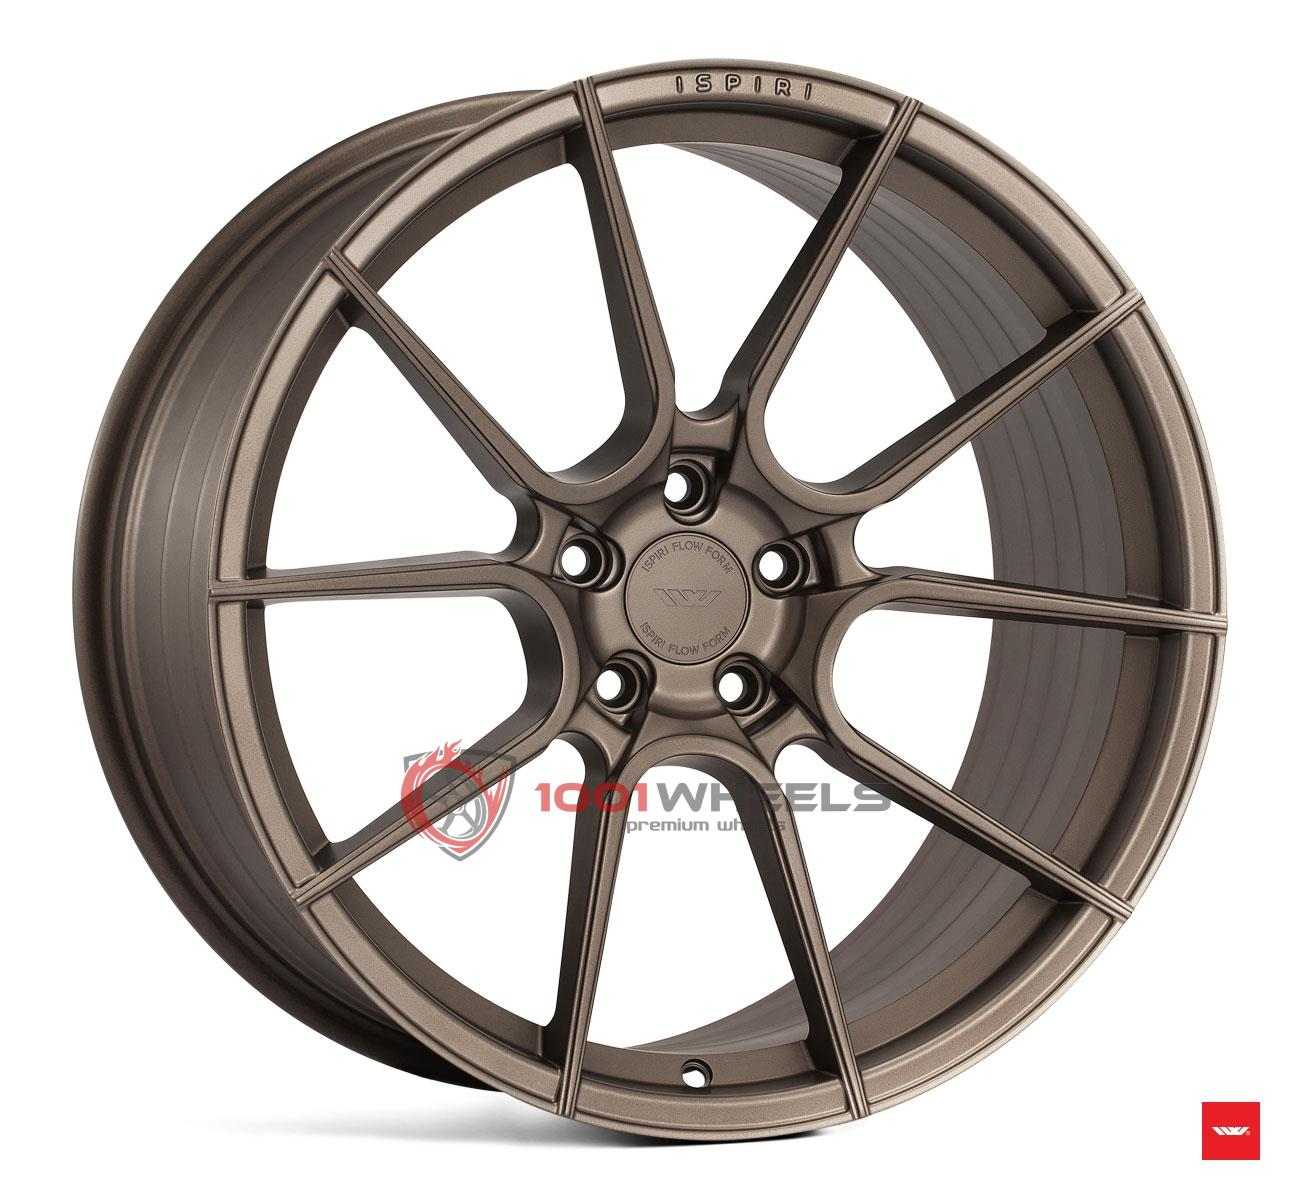 ISPIRI FFR6 matt-carbon-bronze